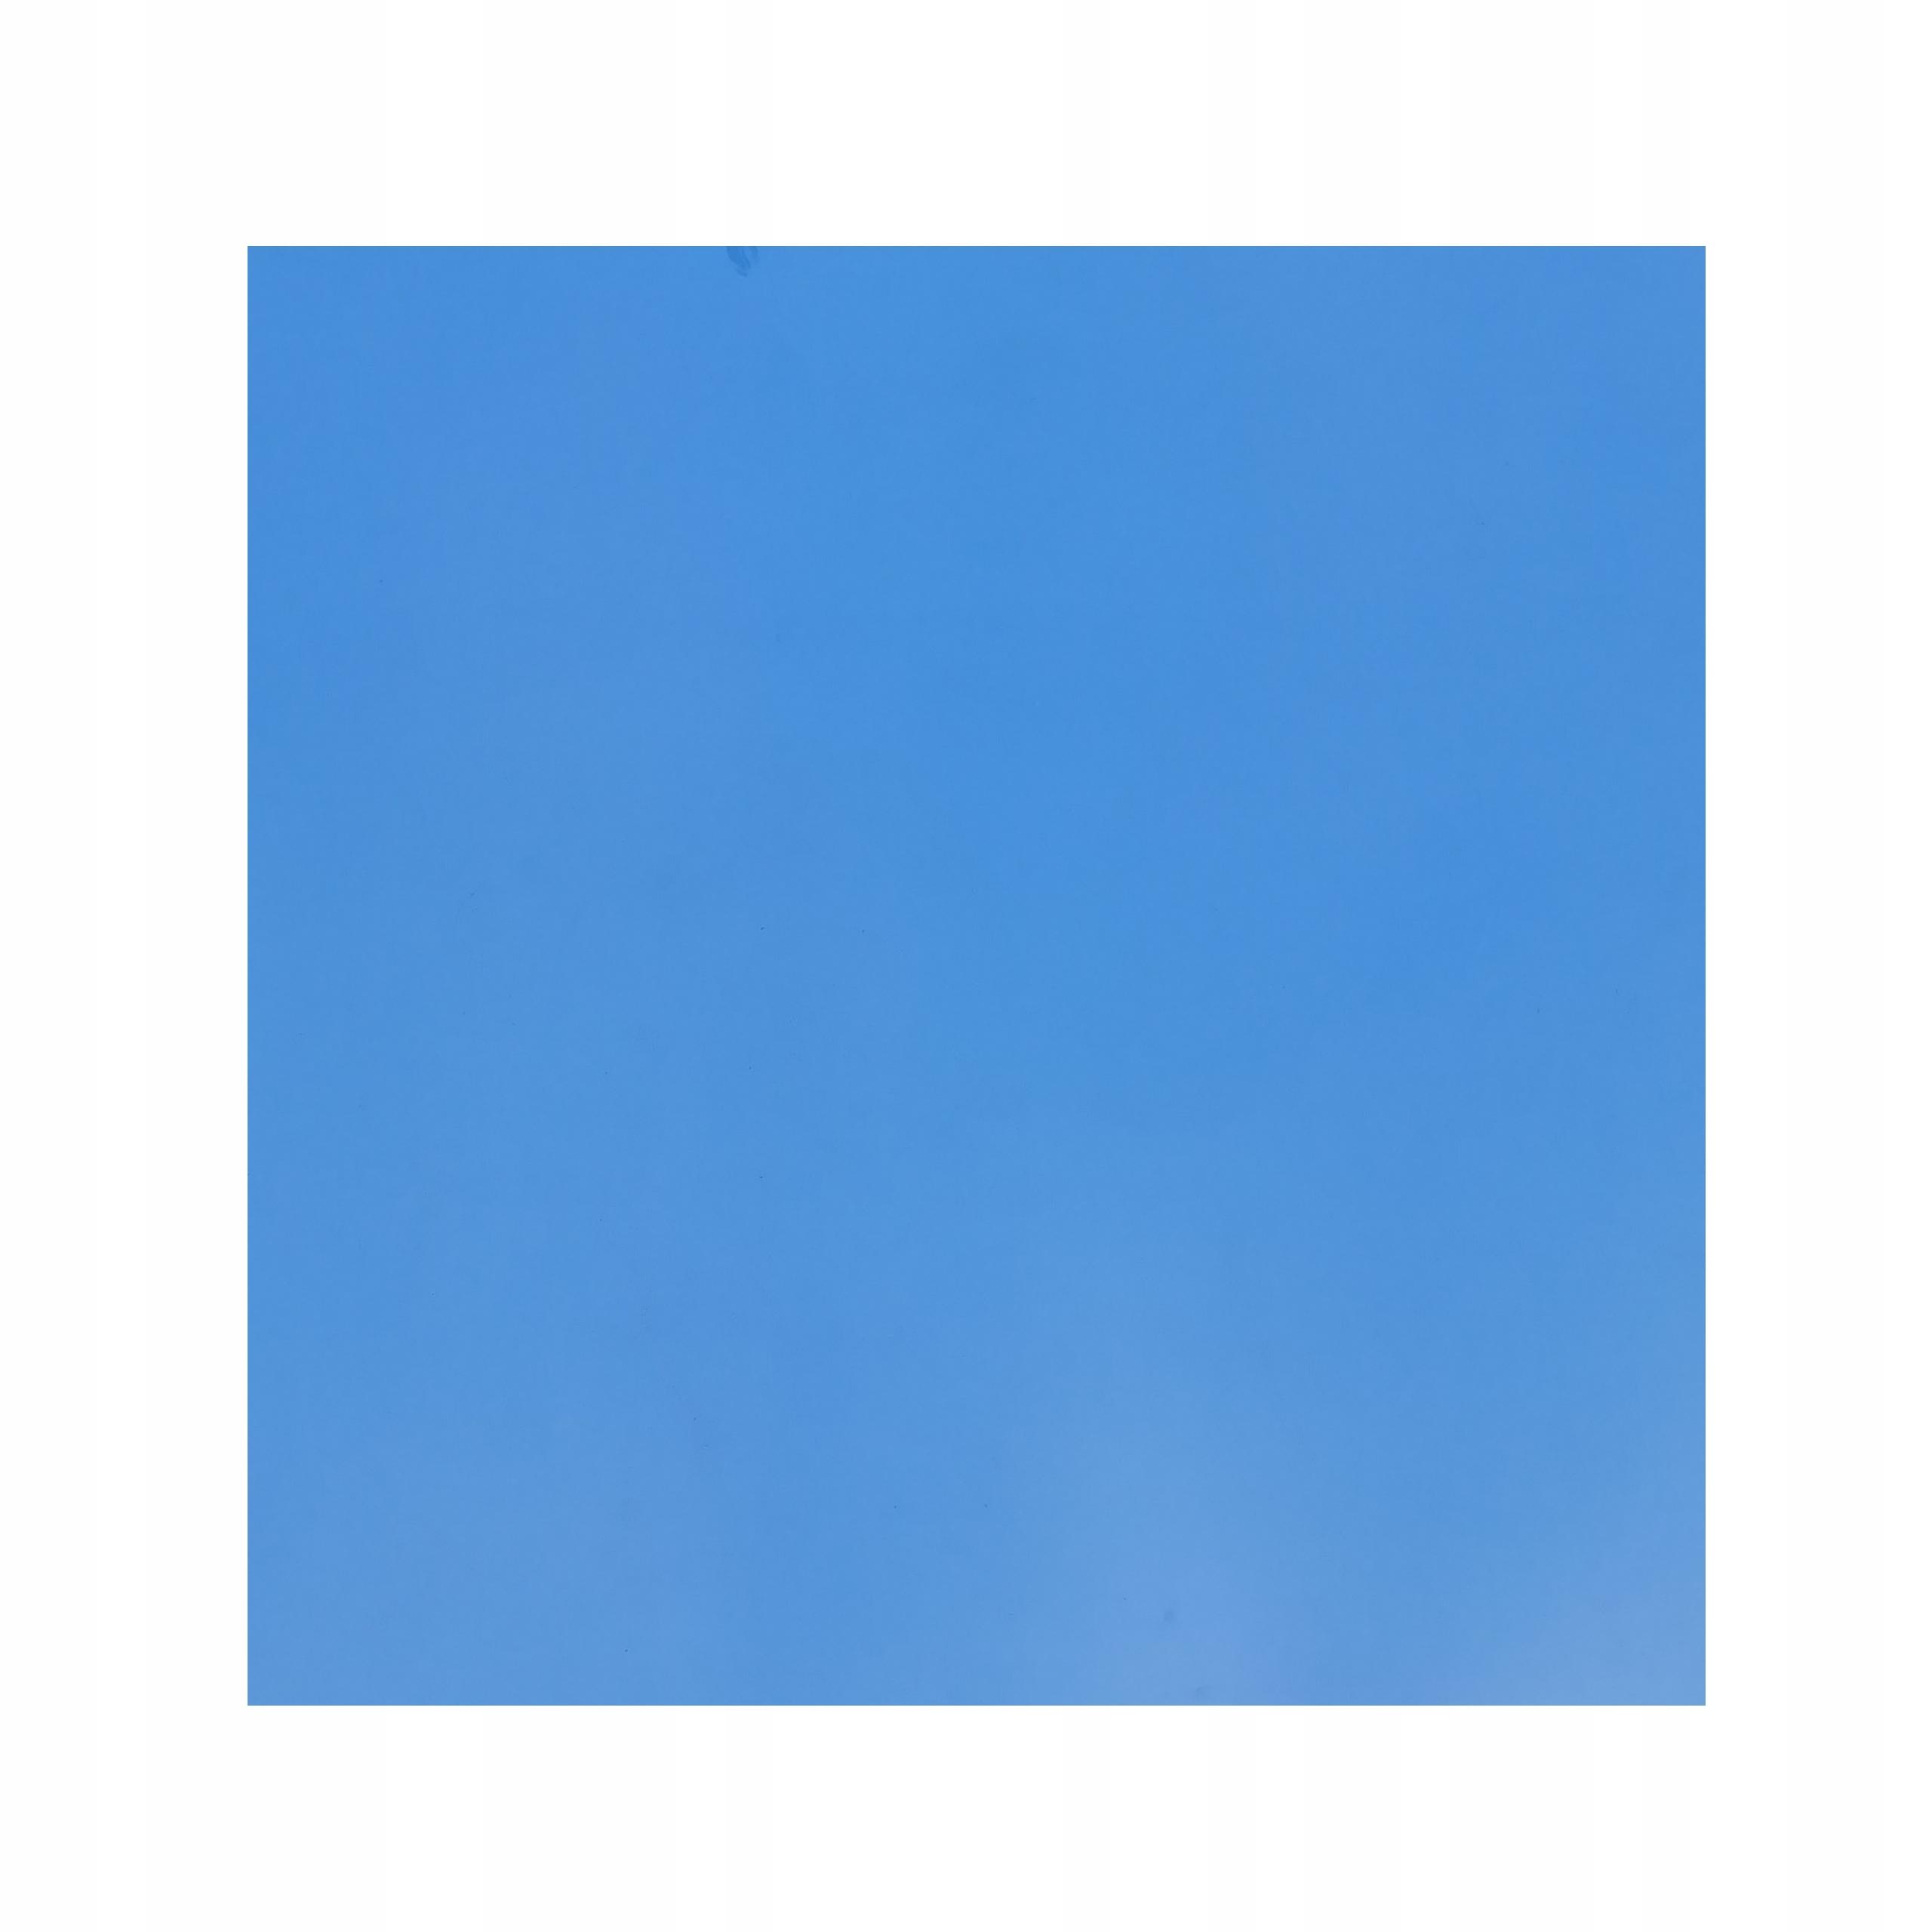 Korekčné svetlomety 202 1/2 CT BLUE